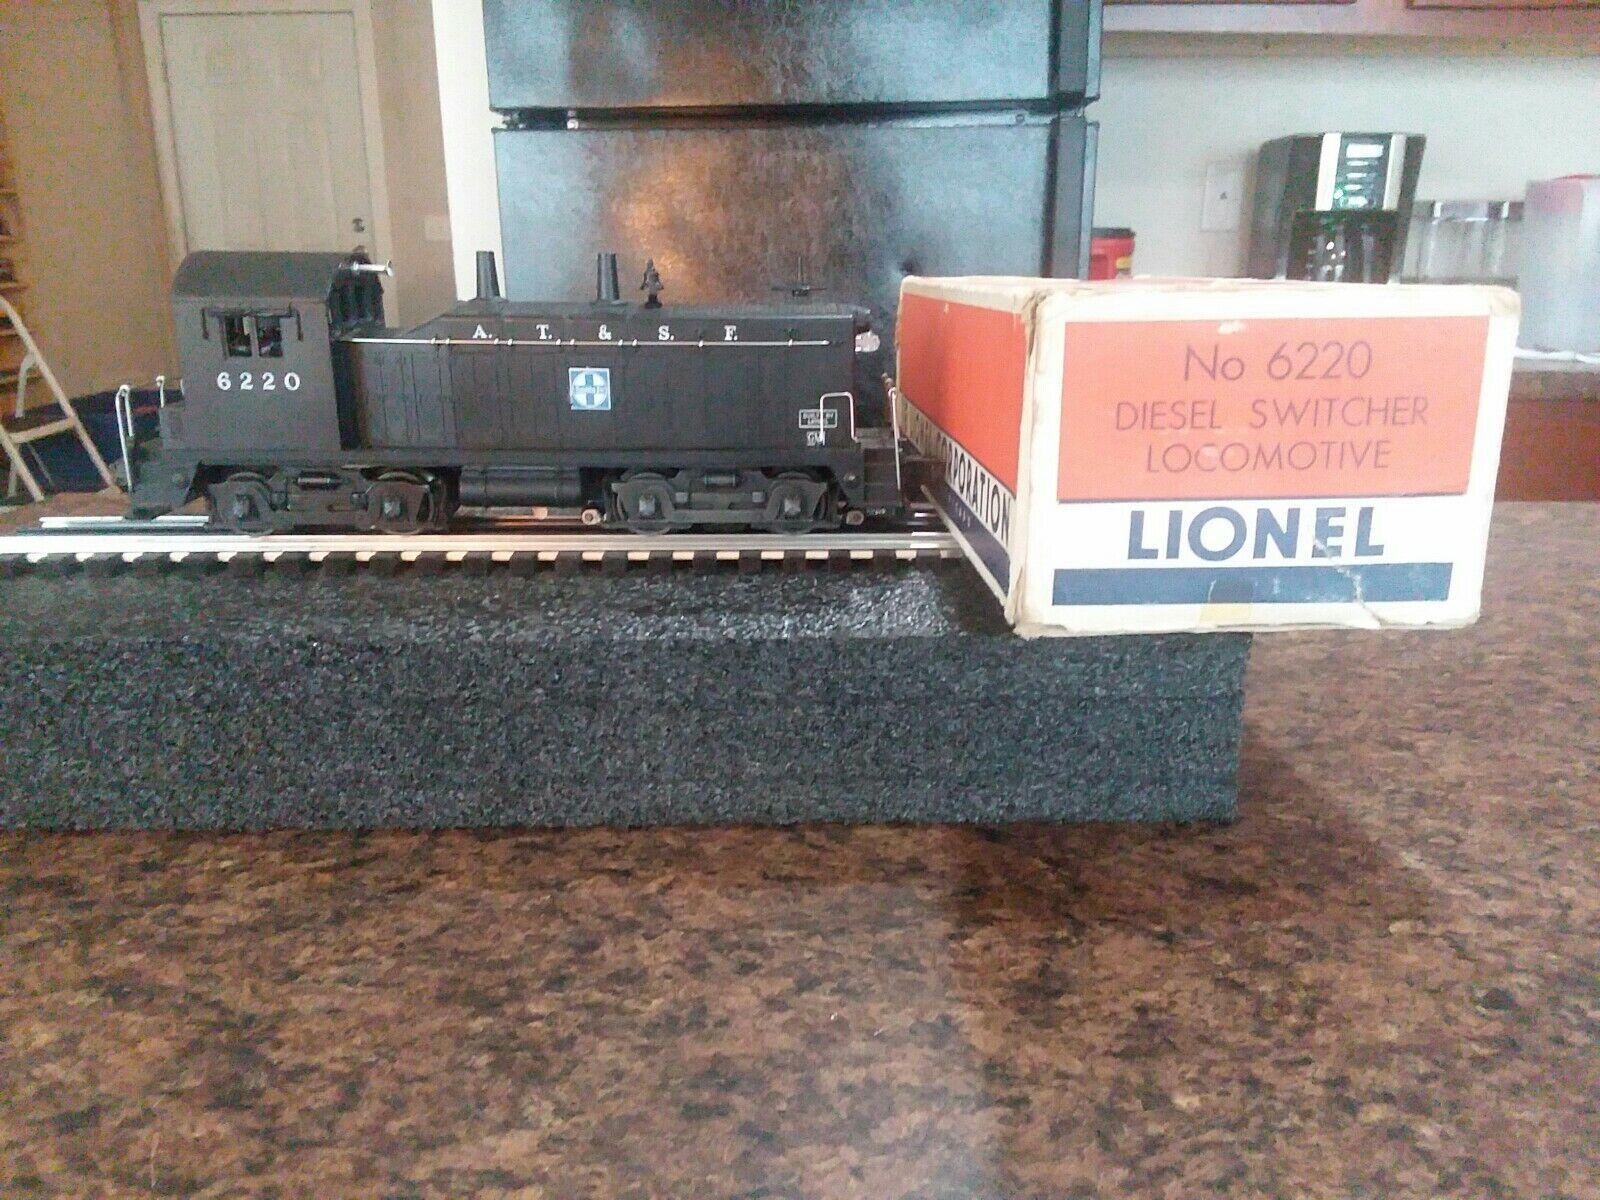 Lionel Train Santa Fe NW-2 Diesel Switcher No. 6220 W Box& insert  Item